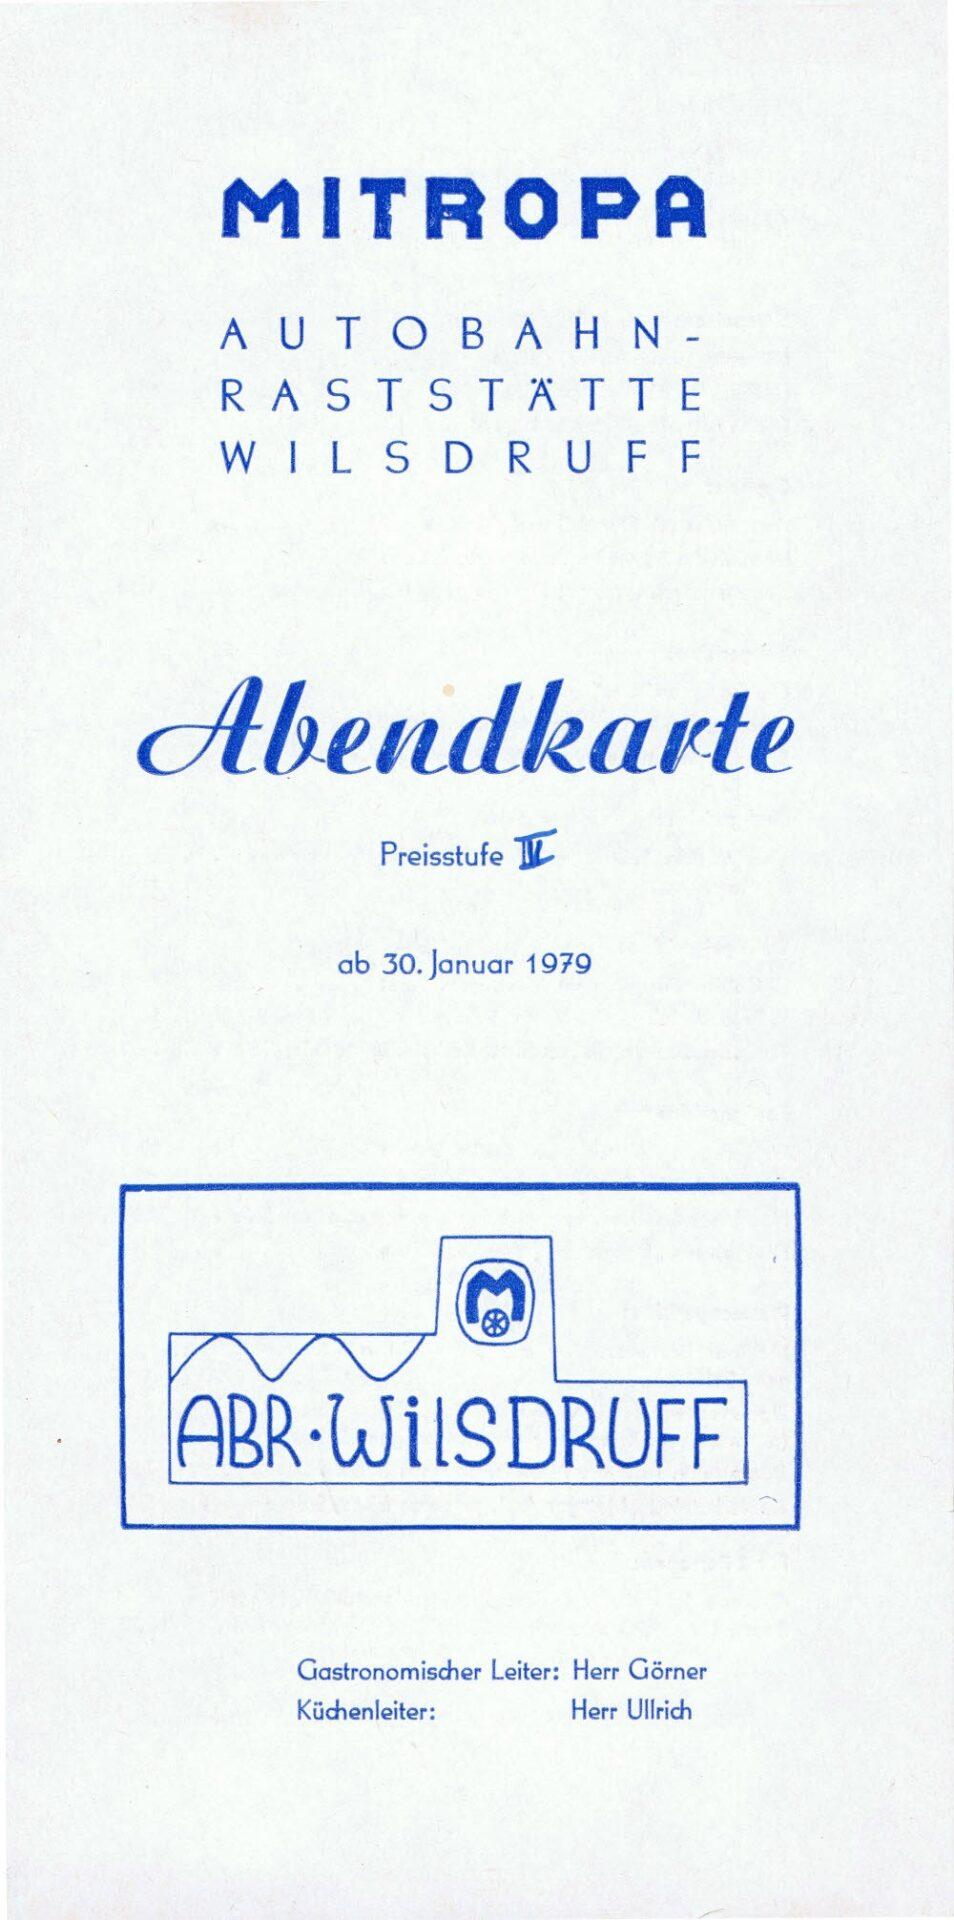 Speisekarte Mitropa Autobahn-Raststätte -Wilsdruff (1979)